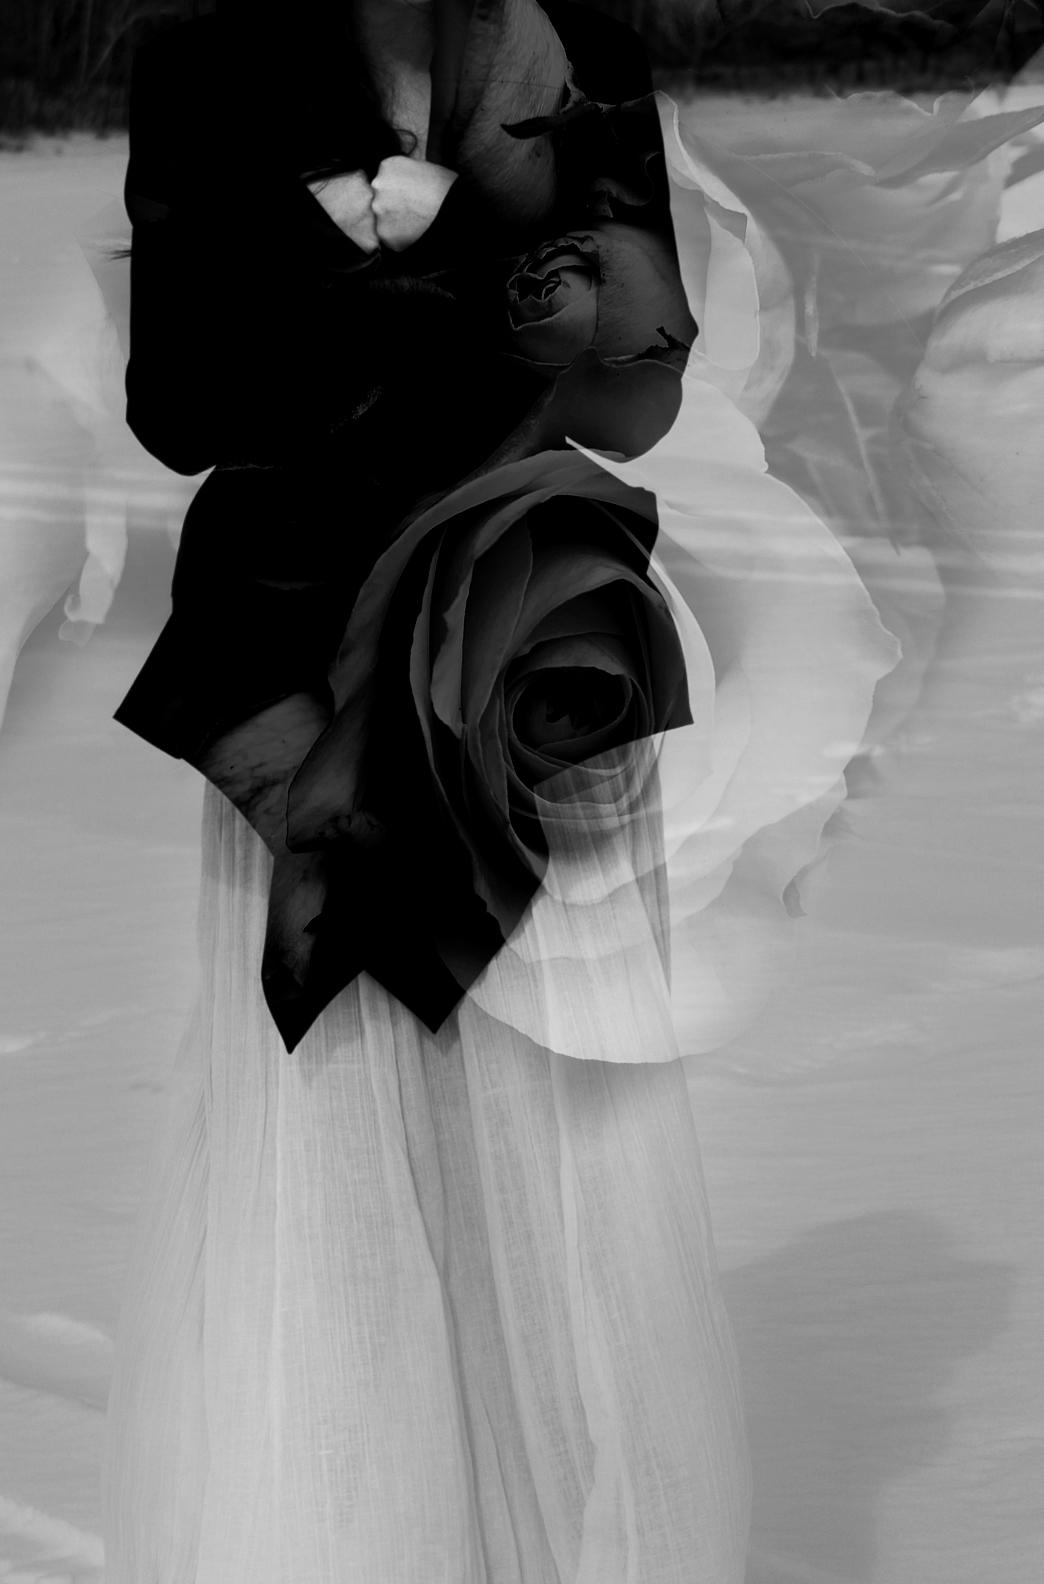 Rose_Overlay_rock and roll_wedding_photography_salt lake city_photographer_offbeat wedding_ unique